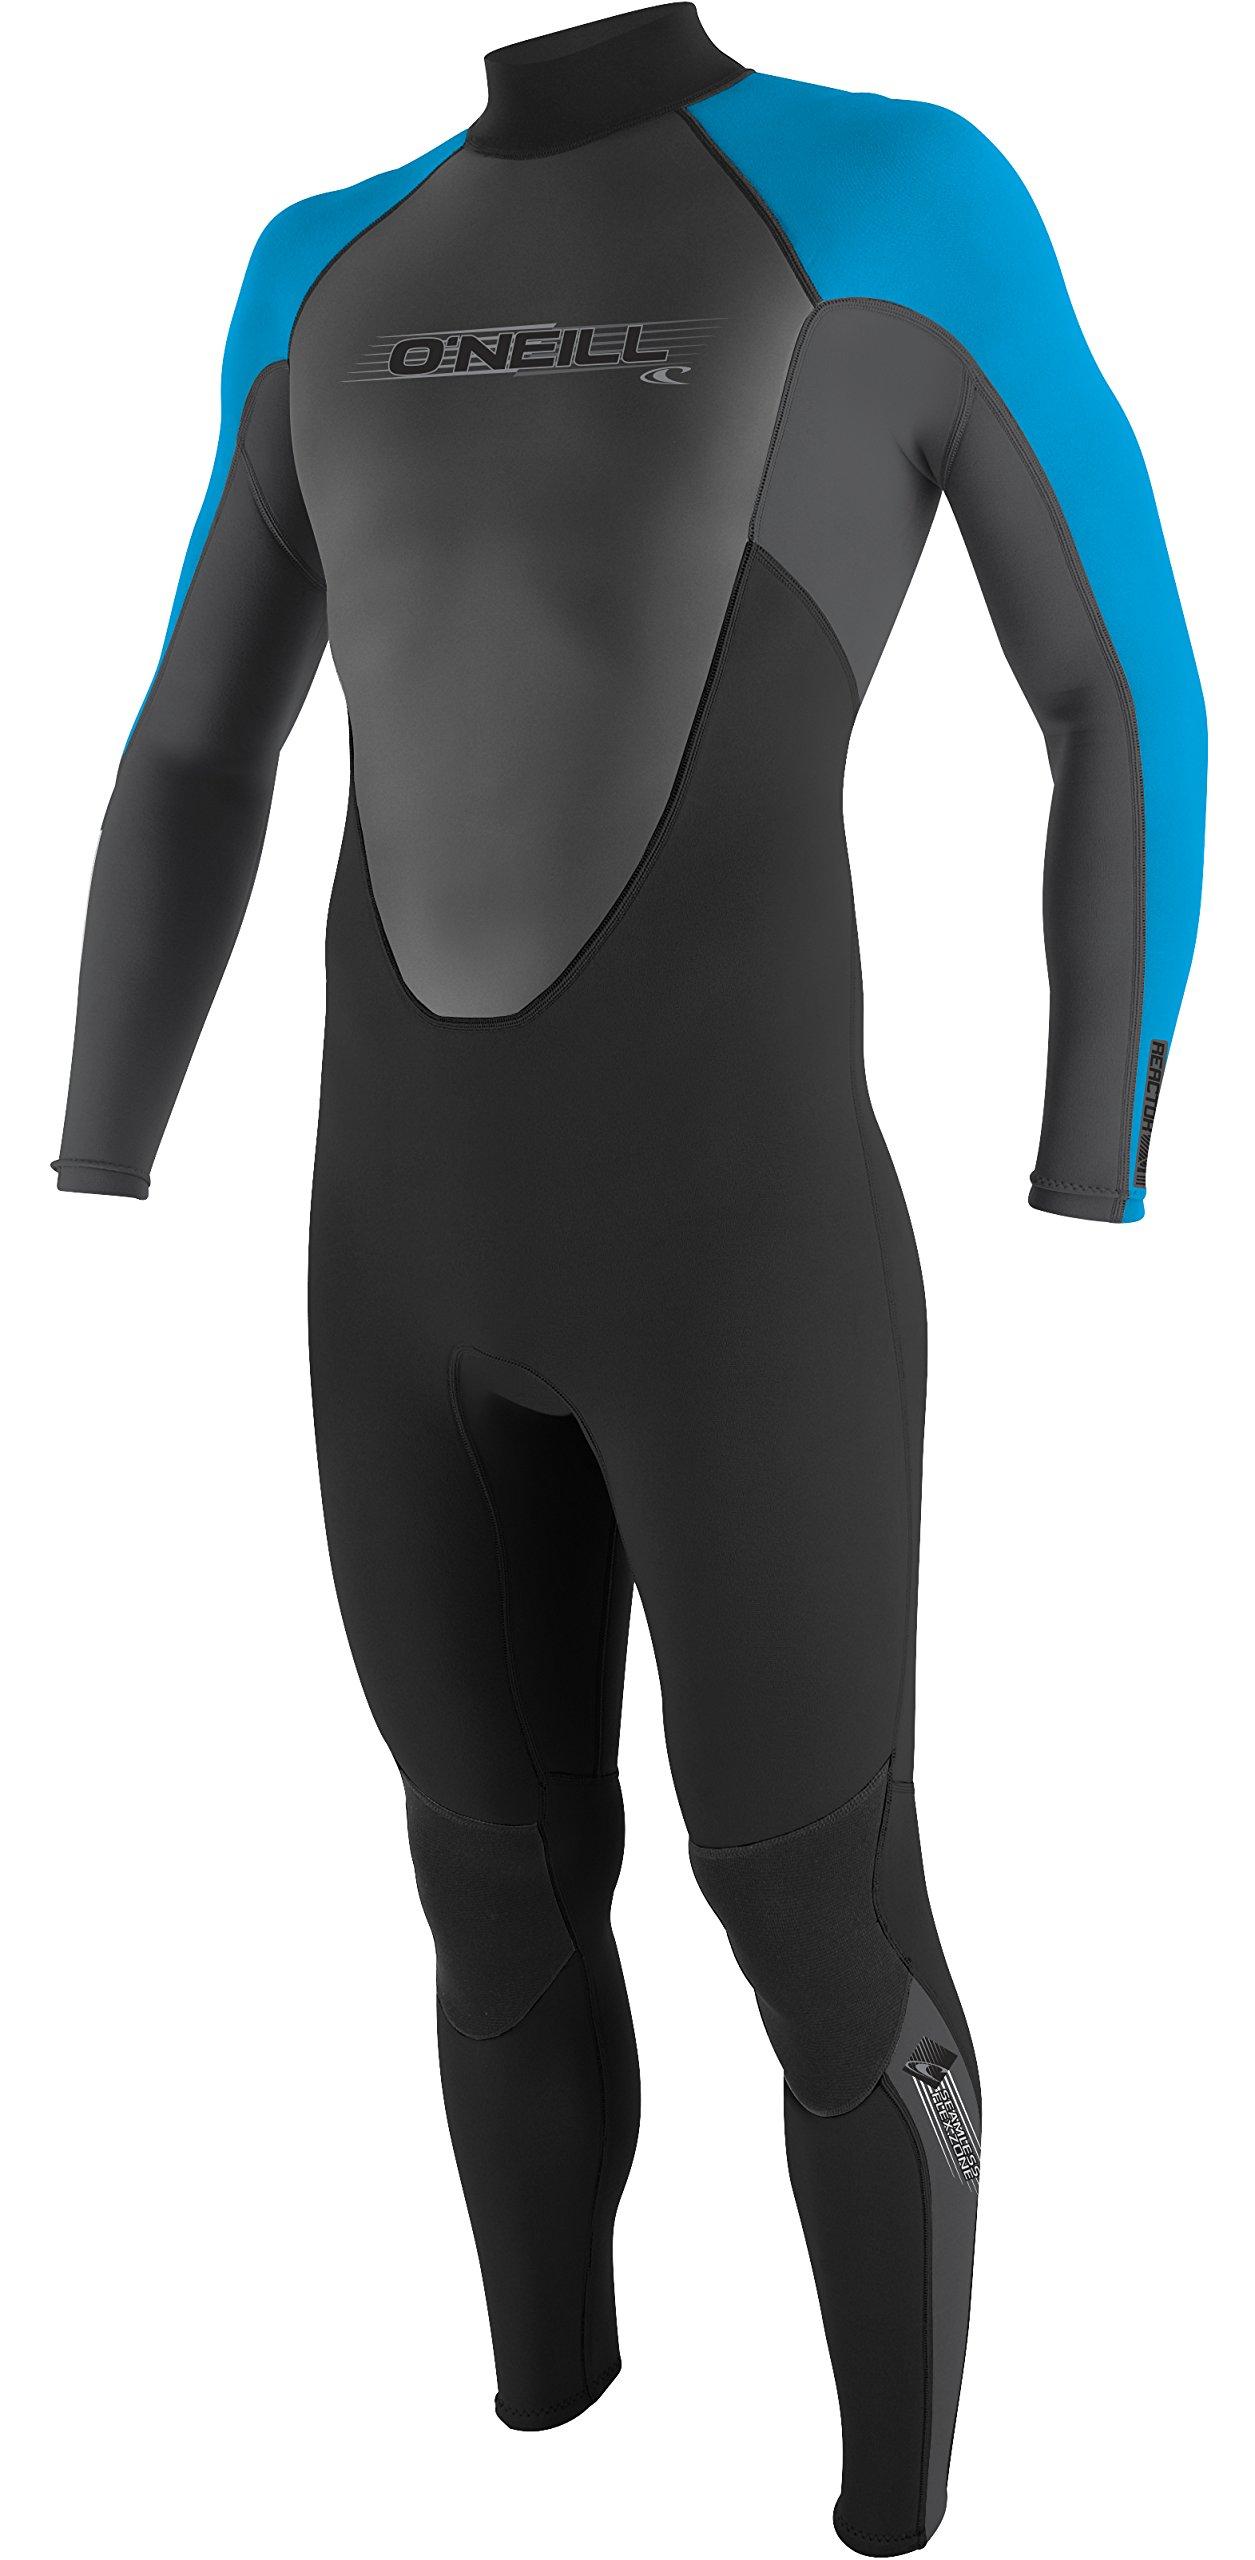 O'Neill Wetsuits Men's 3/2mm Reactor Full Suit, Black Smoke Tahiti, Small